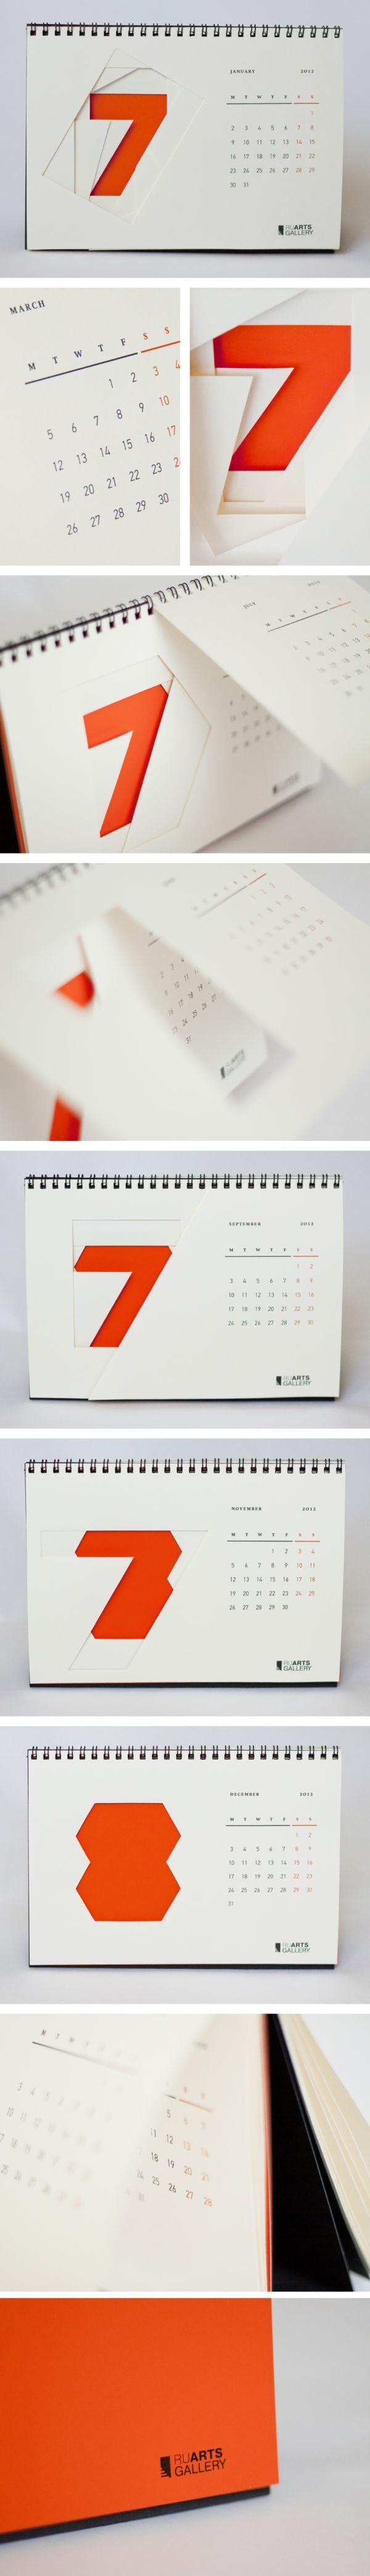 7th anniversary calendar (scheduled via http://www.tailwindapp.com?utm_source=pinterest&utm_medium=twpin&utm_content=post3544589&utm_campaign=scheduler_attribution)